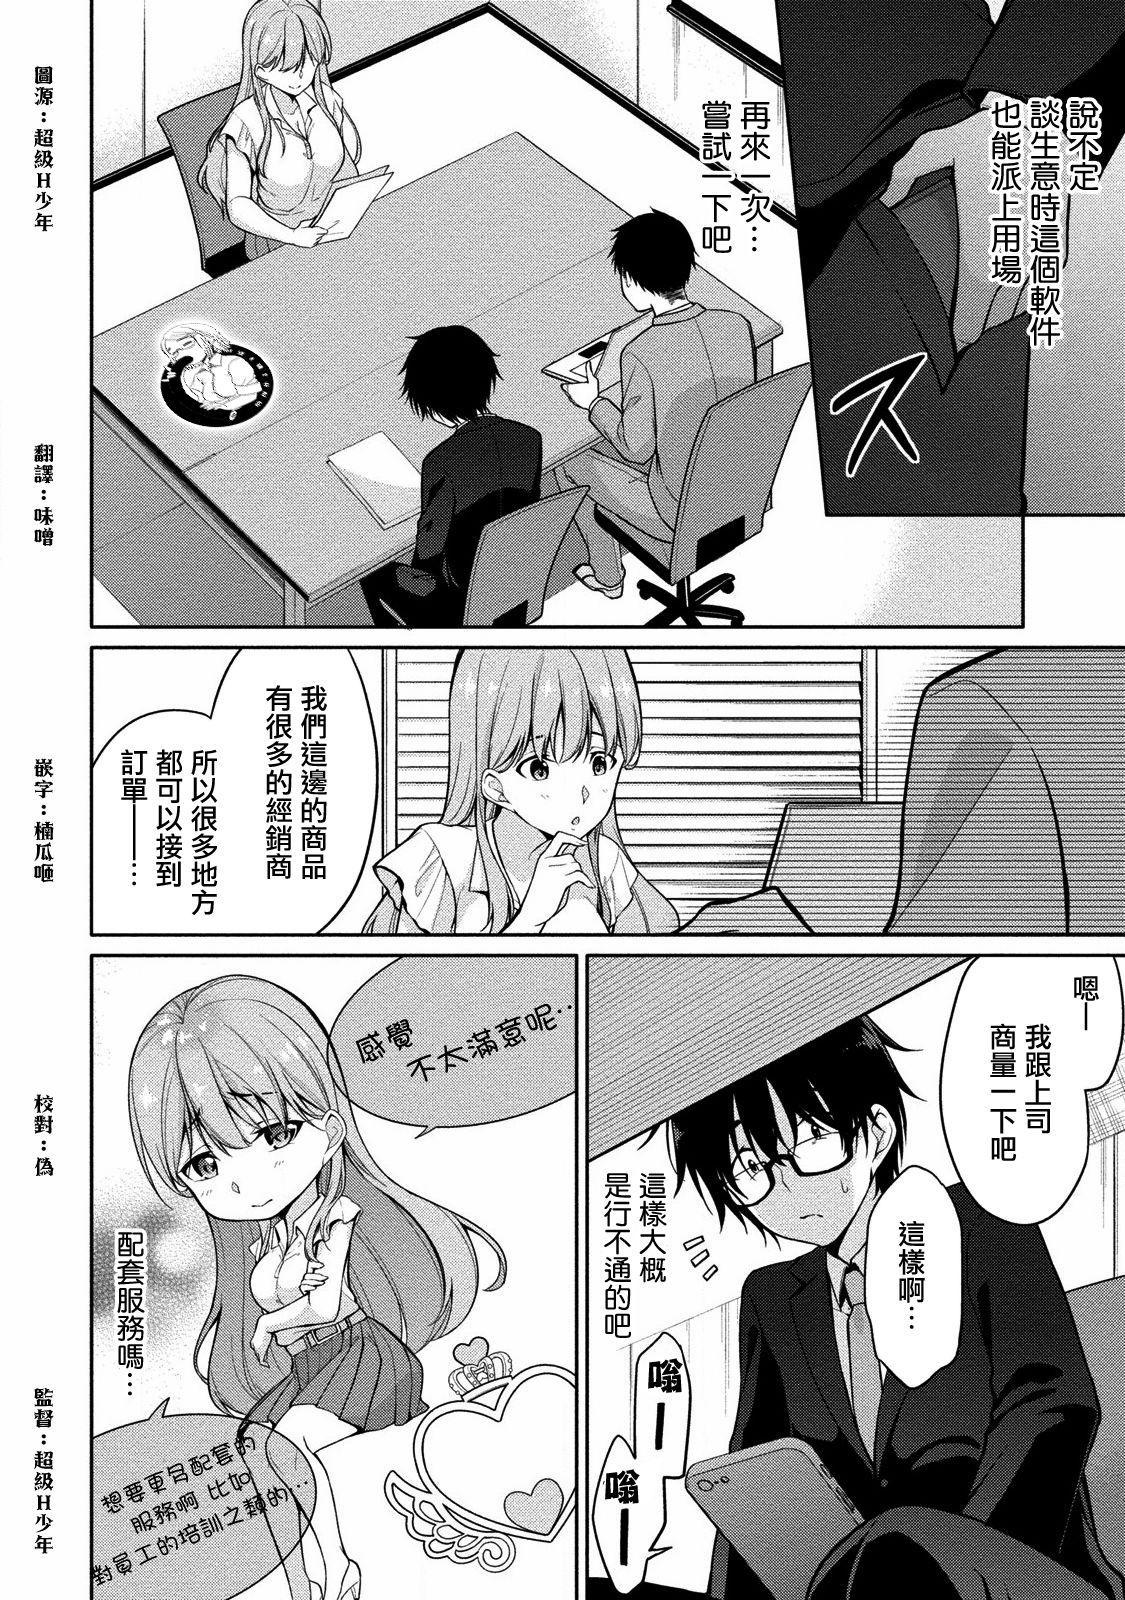 [Yukino] Satou-kun wa Miteiru. ~Kami-sama Appli de Onnanoko no Kokoro o Nozoitara Do XX datta~ Ch. 2 | 佐藤君正在偷窥。~用神大人的APP偷窥女孩子的内心却发现原来是抖XX~02话 [Chinese] [前线作♂战♀基地] 7